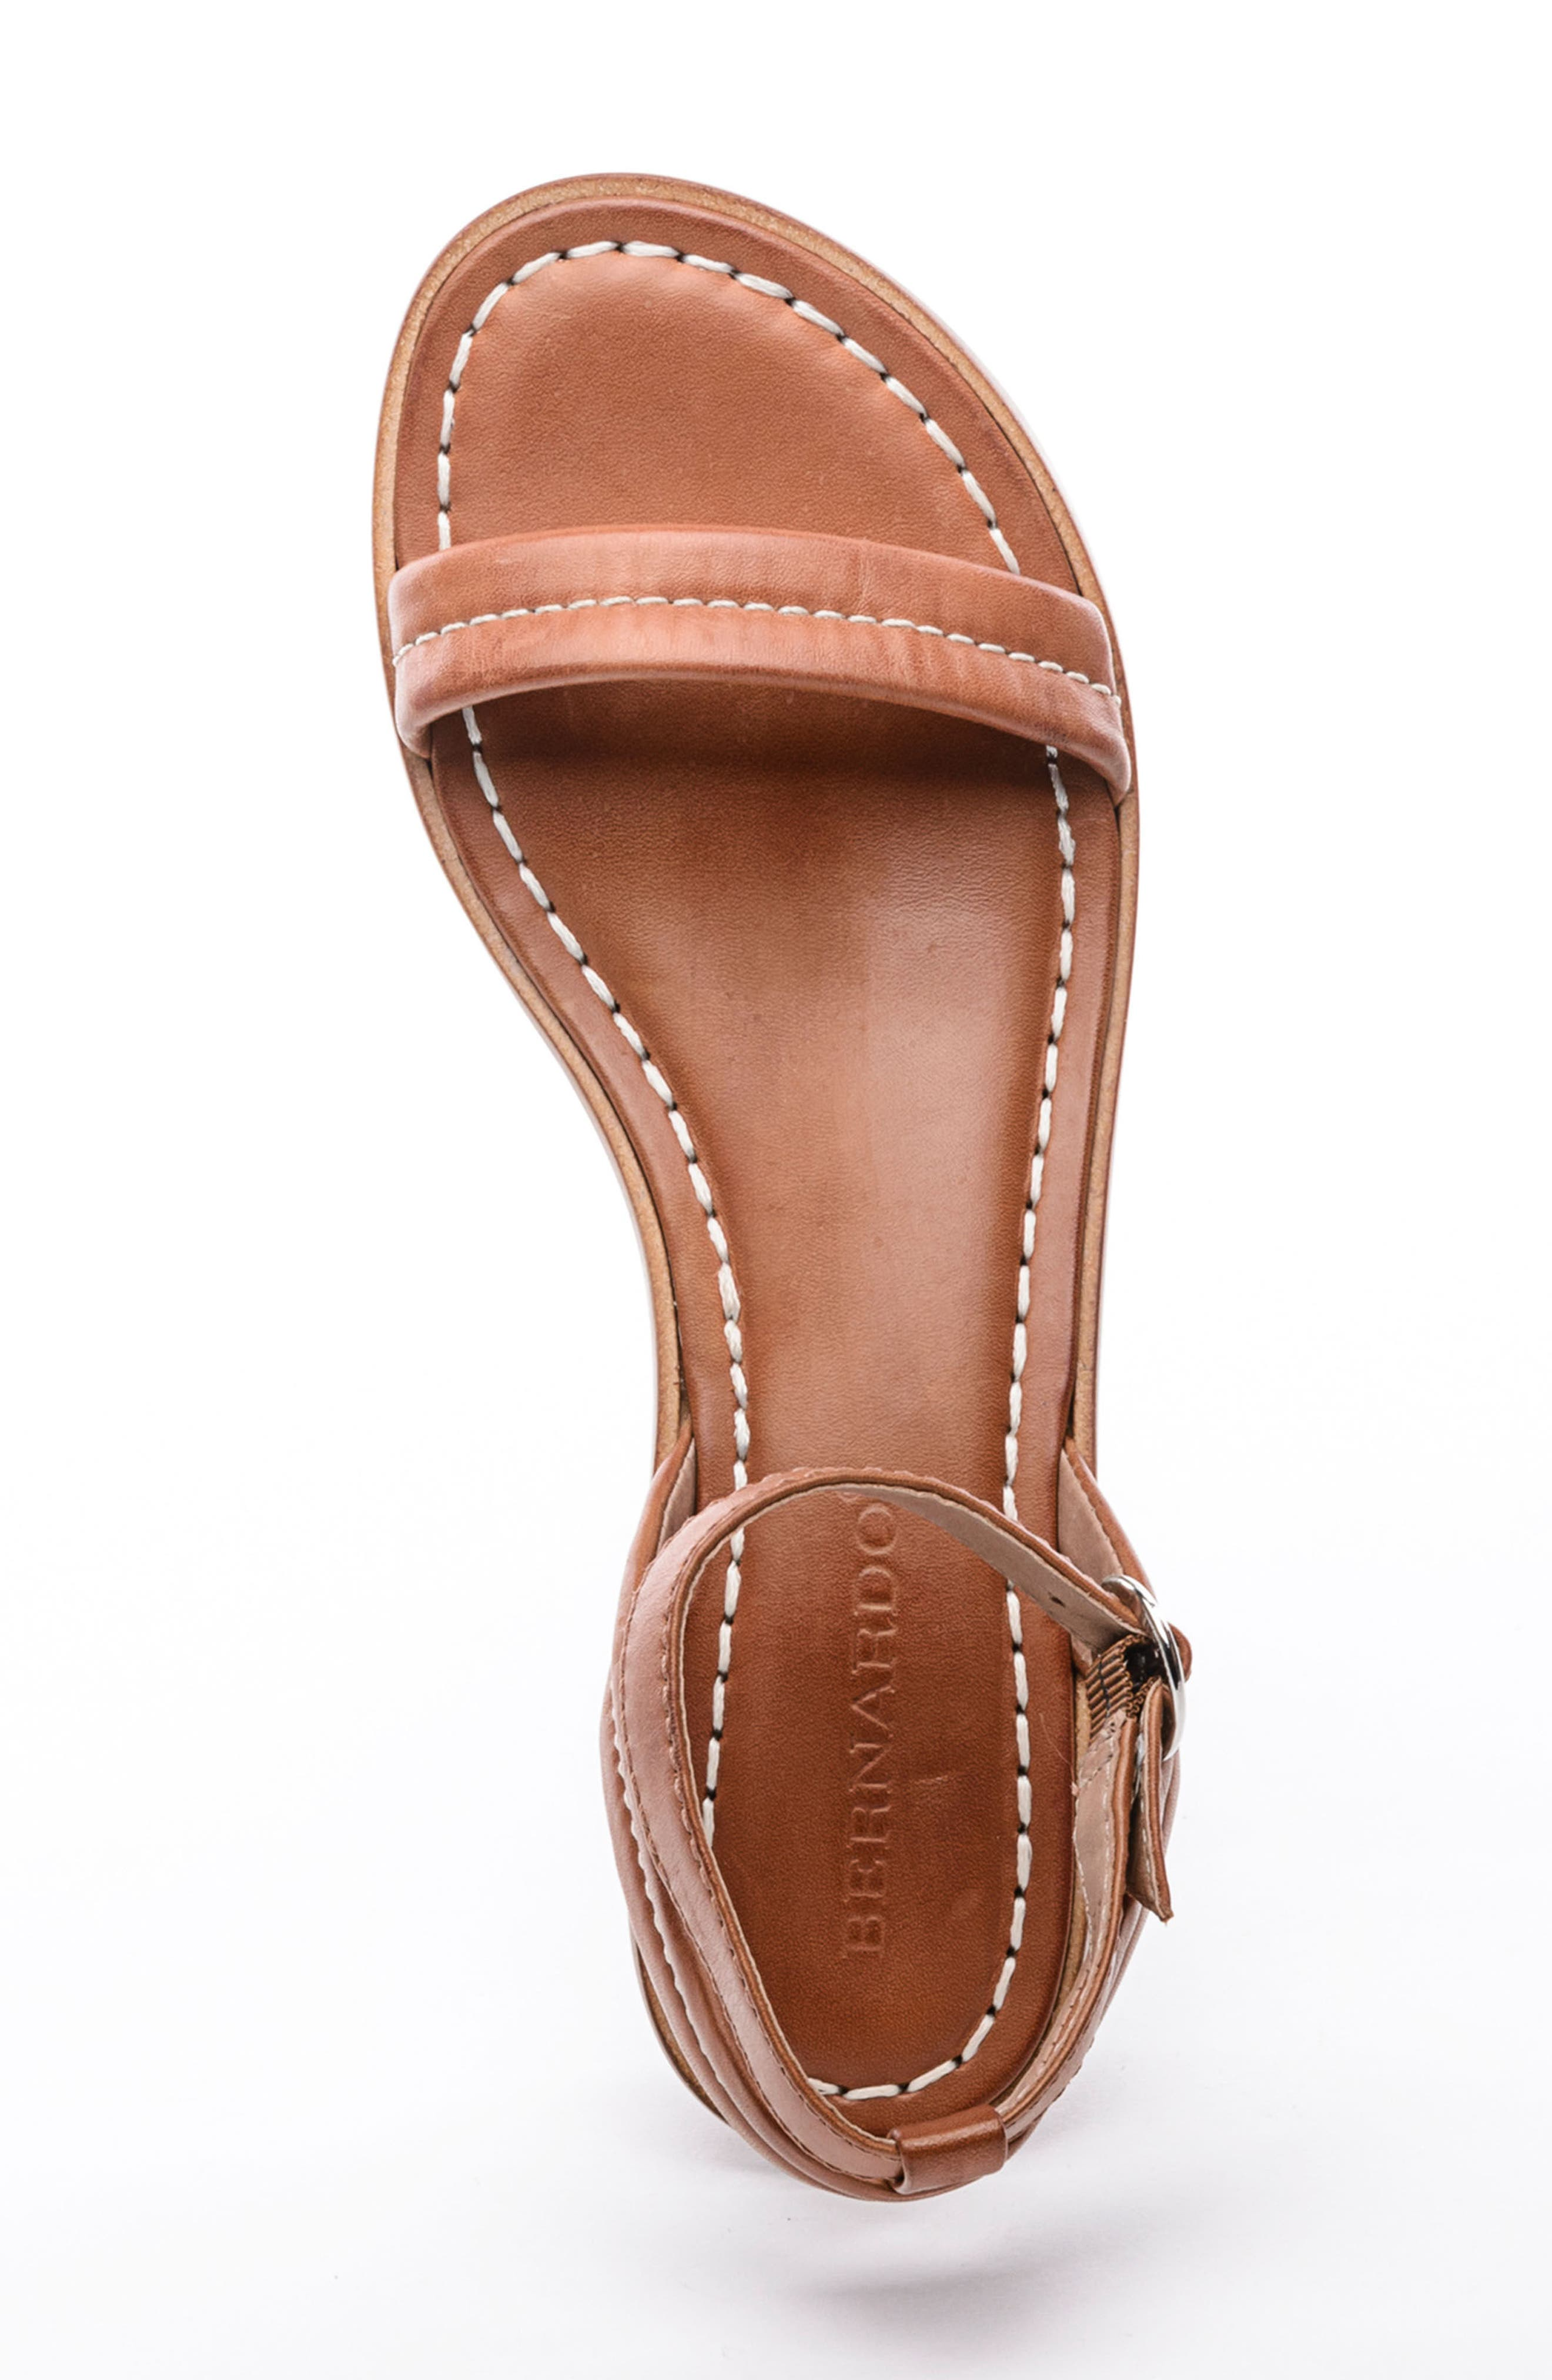 BERNARDO, Catherine Ankle Strap Sandal, Alternate thumbnail 5, color, LUGGAGE BROWN ANTIQUE